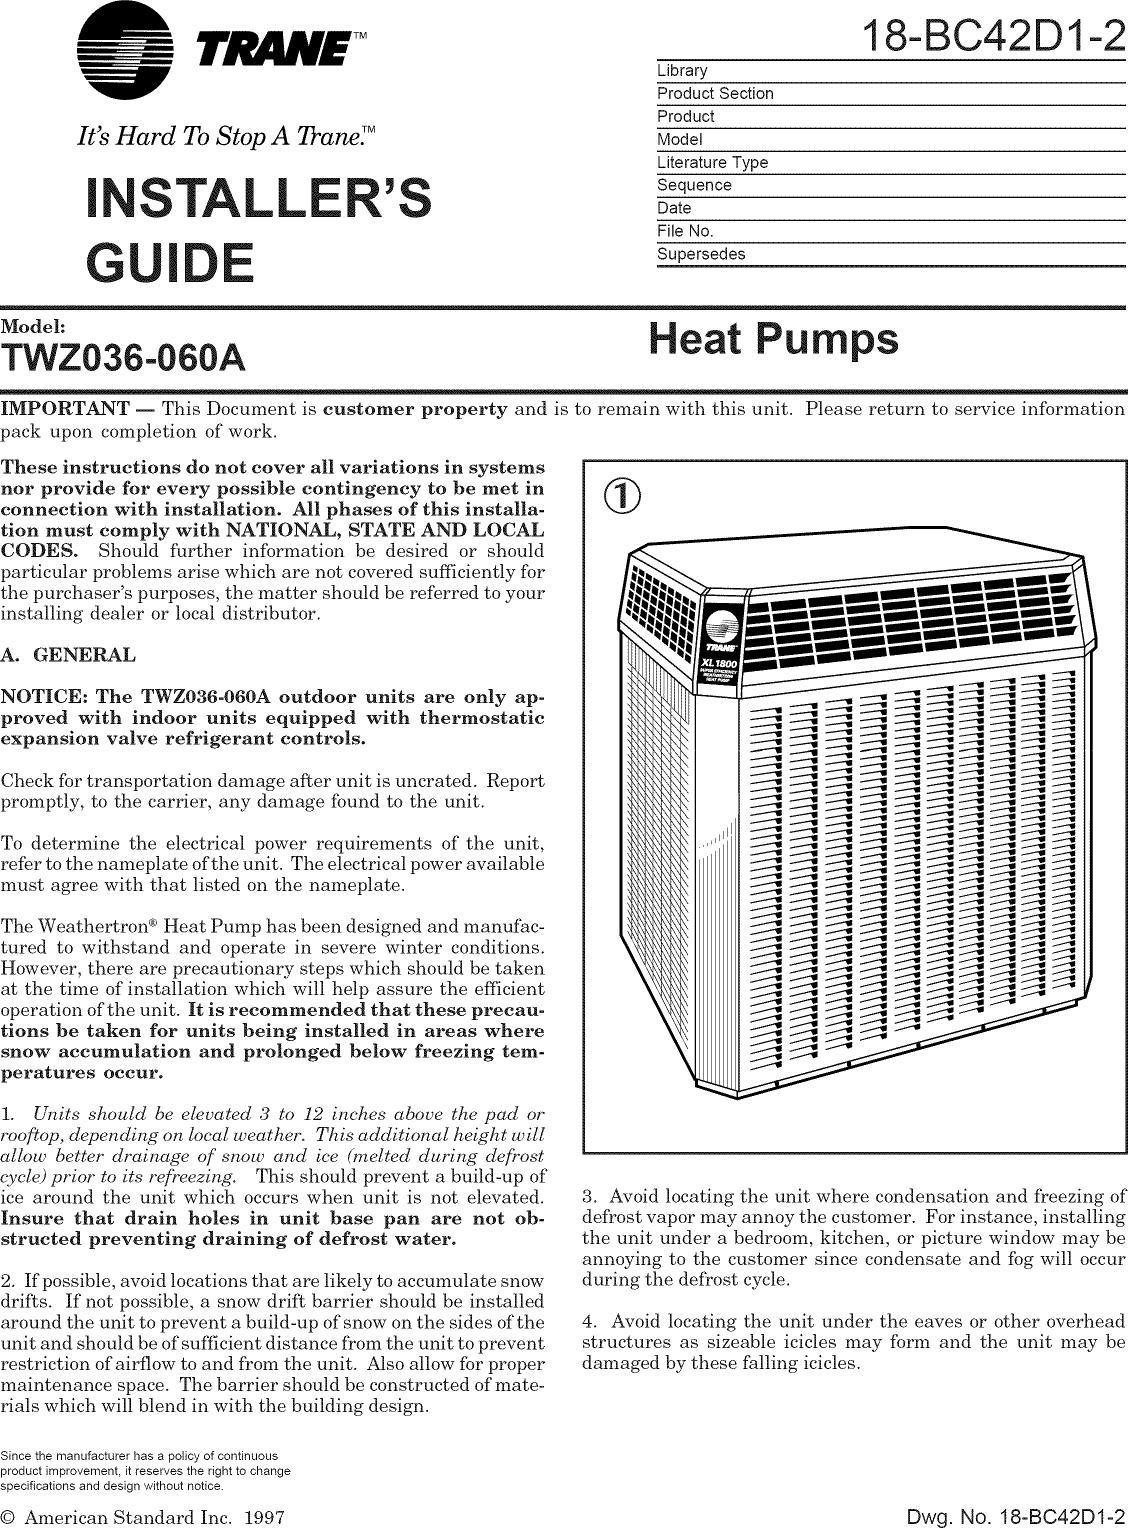 trane airconditioner manual model no wcy036f100aa